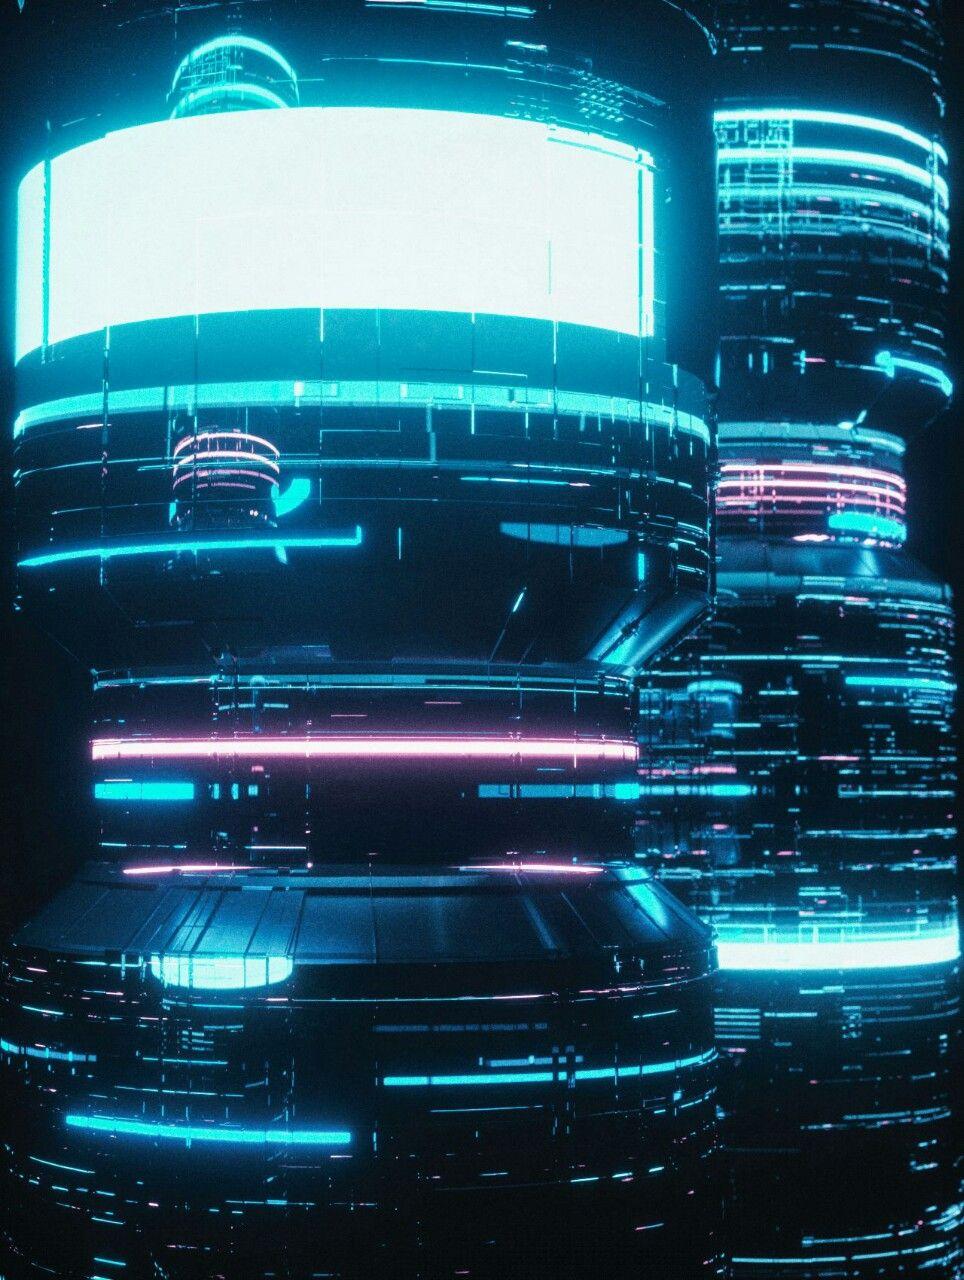 Cyberpunk Images